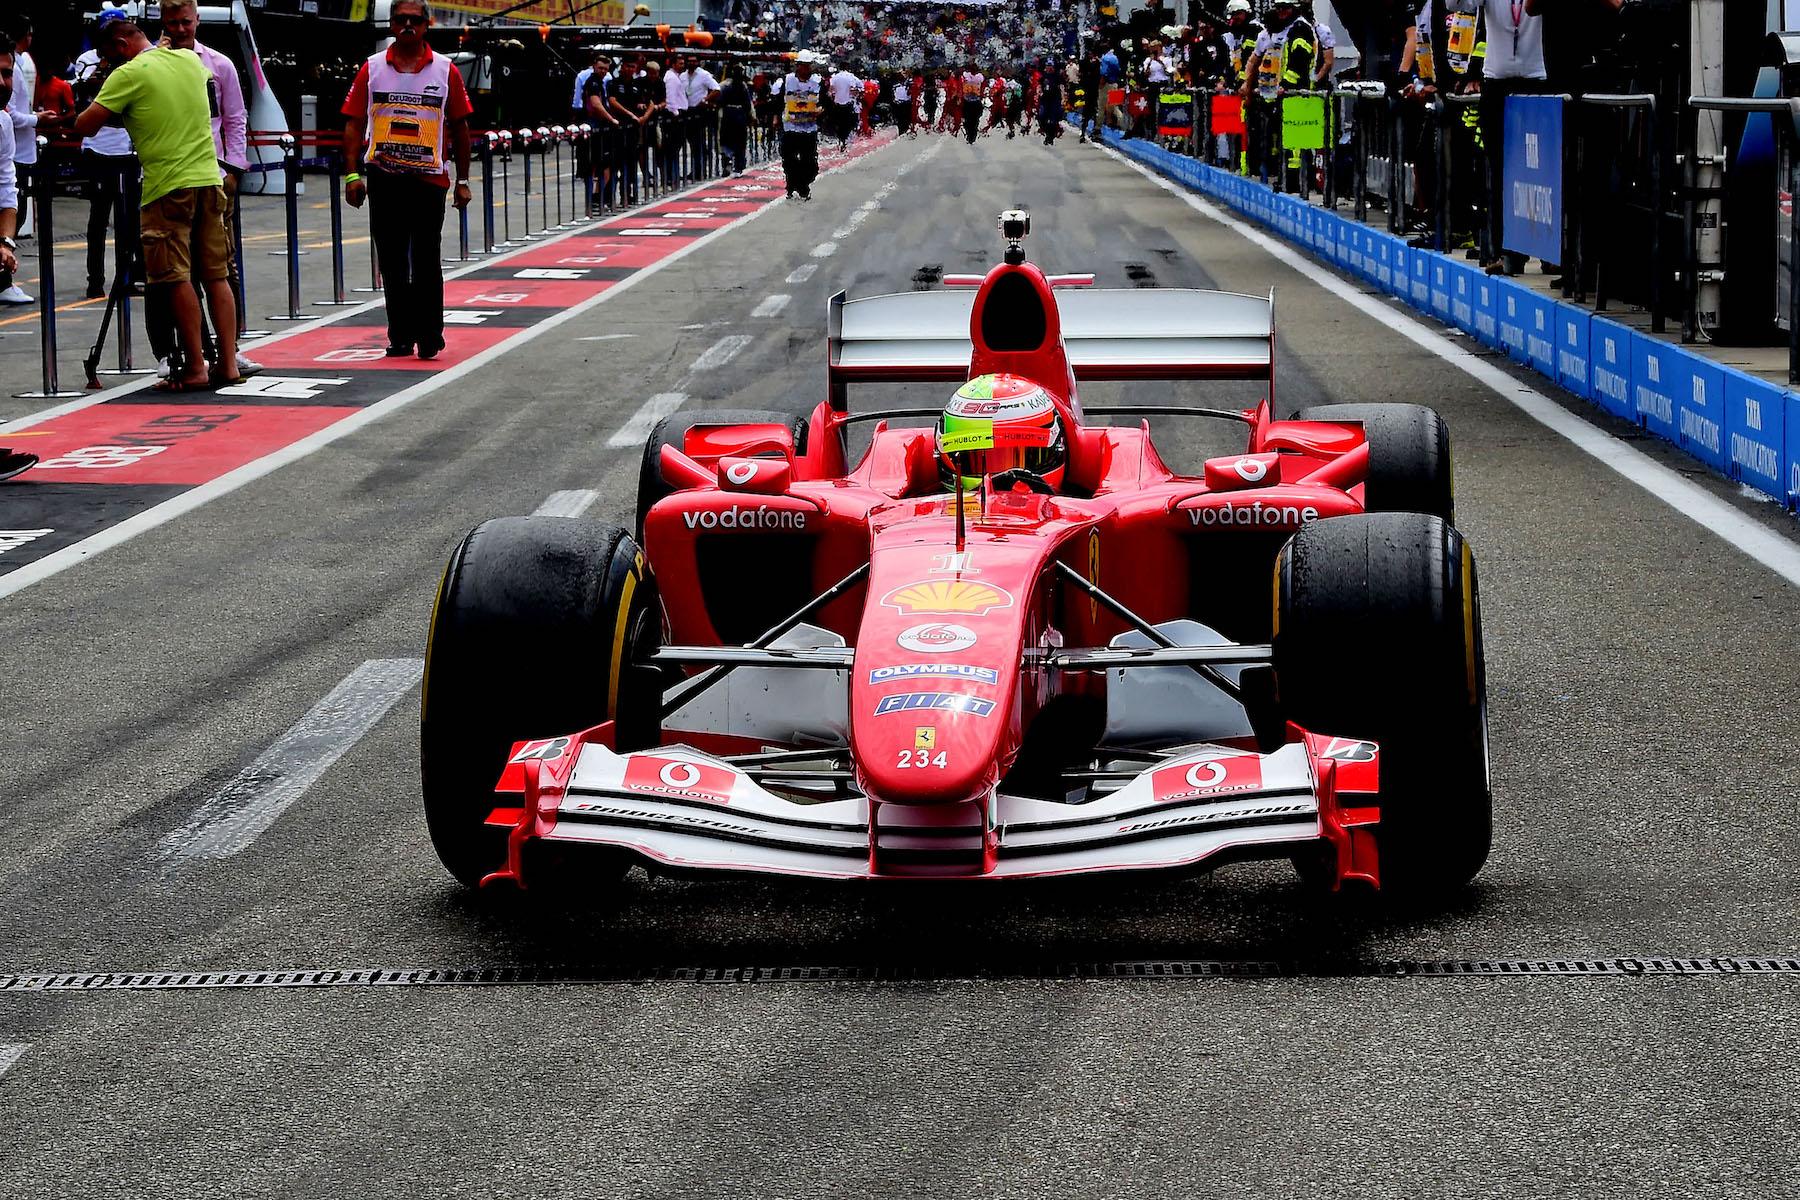 2019 Mick Schumacher | Ferrari F2004 | 2019 German GP 3 copy.jpg